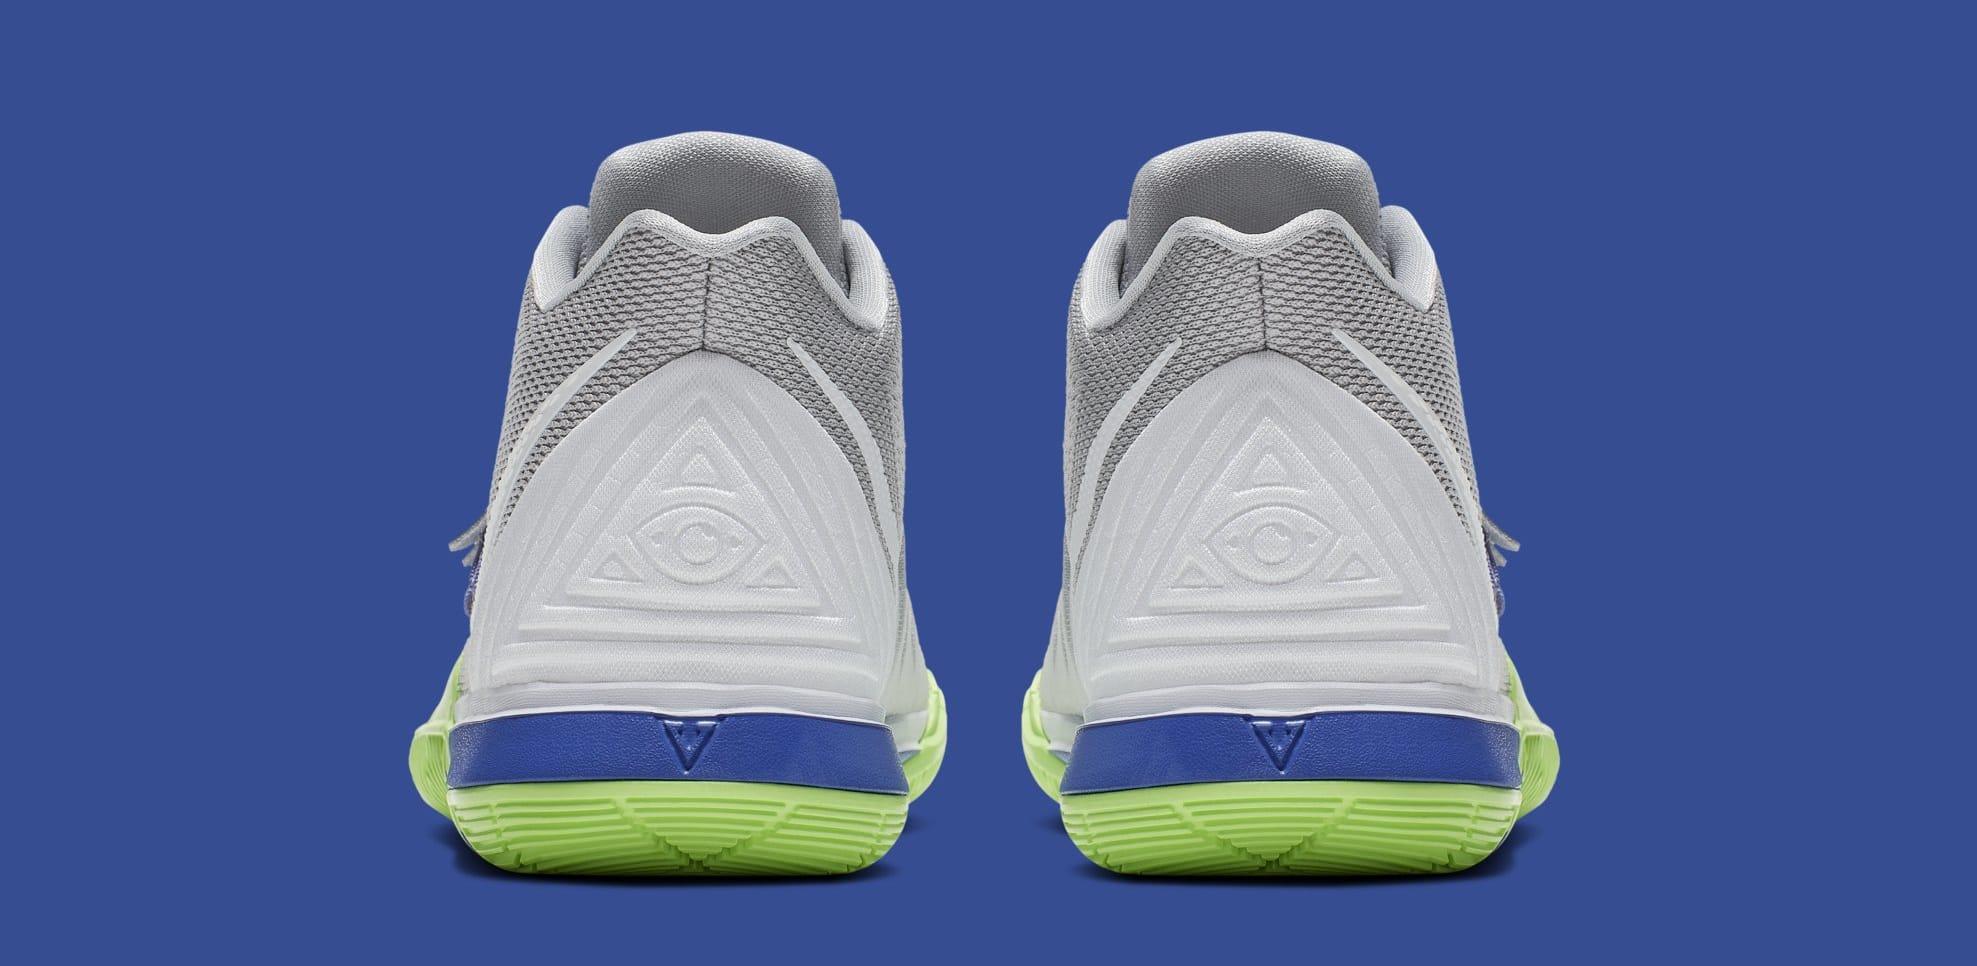 Nike Kyrie 5 AQ2456-099 (Heel)